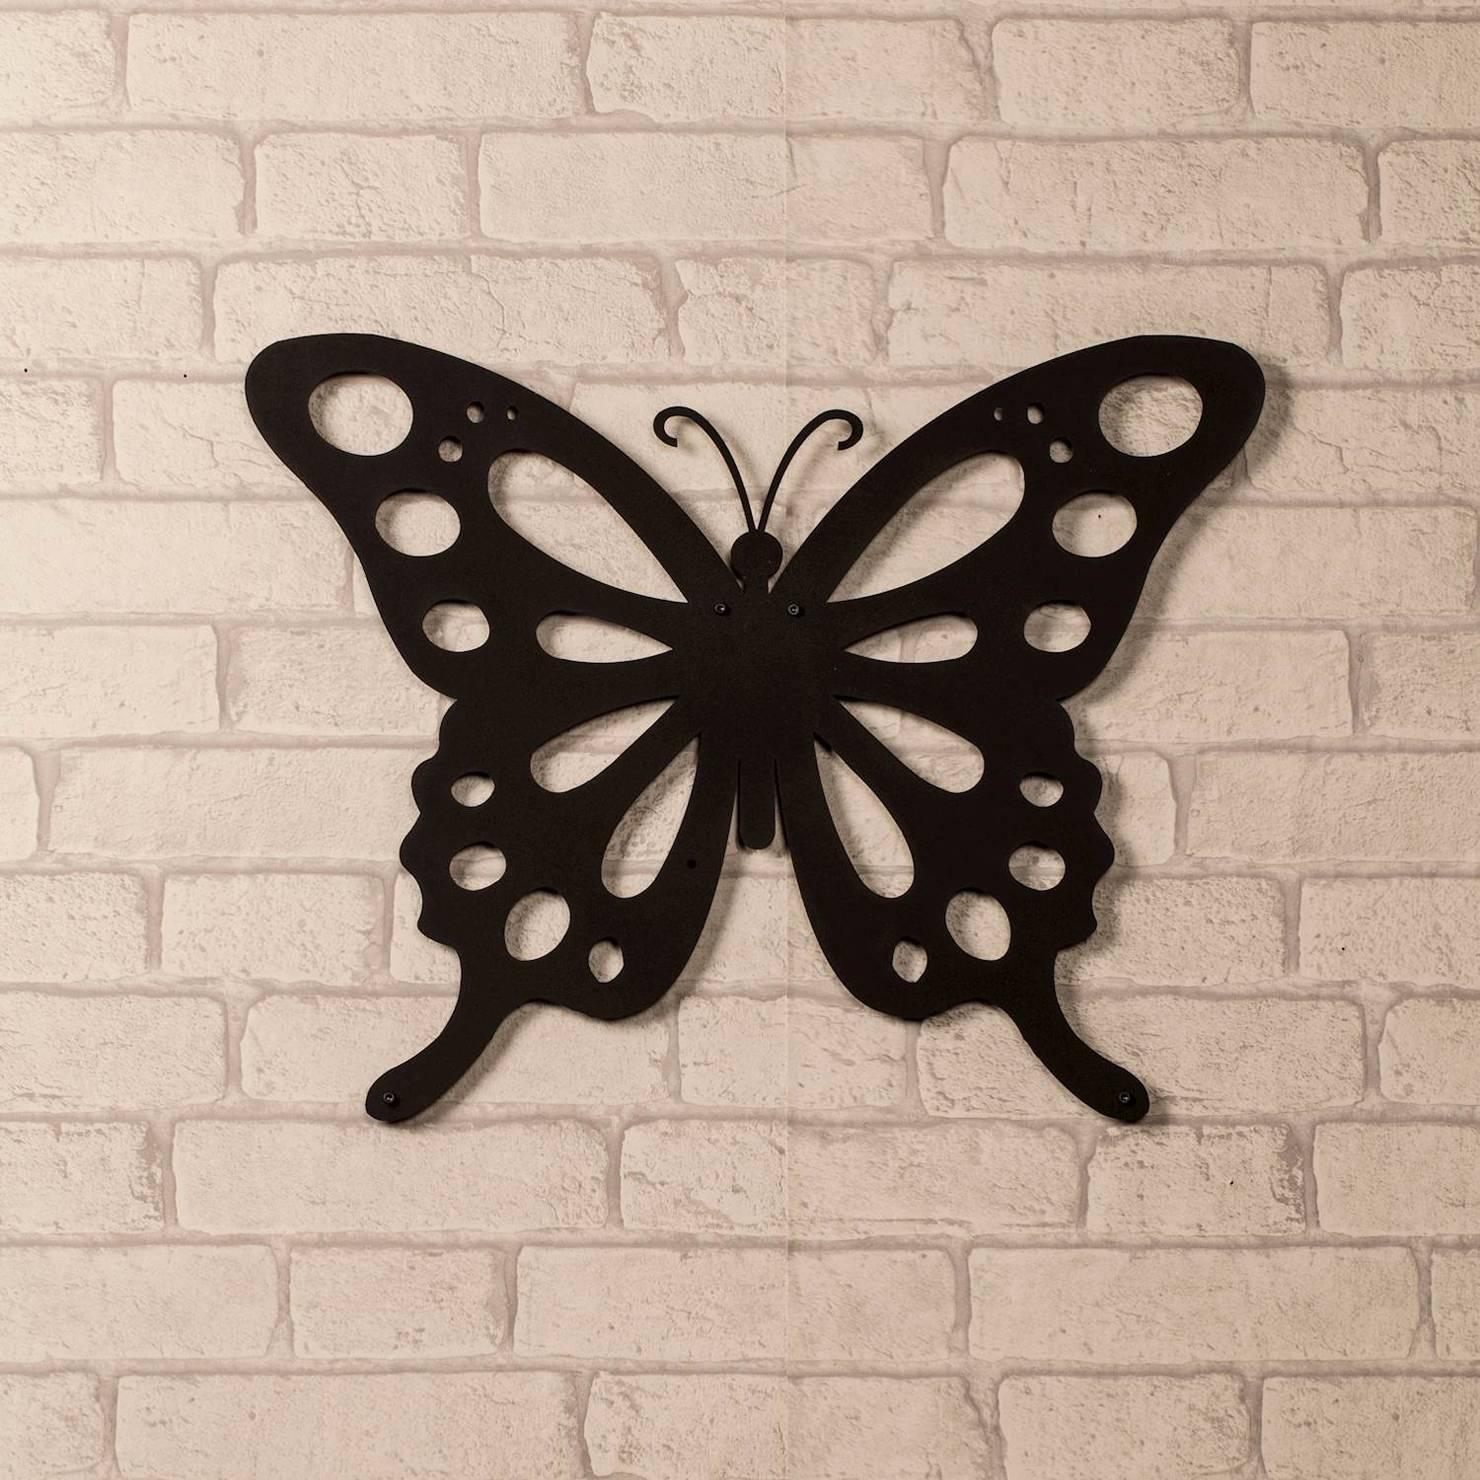 Butterfly Metal Wall Art, Black | Achica Intended For 2018 Butterfly Metal Wall Art (View 9 of 20)